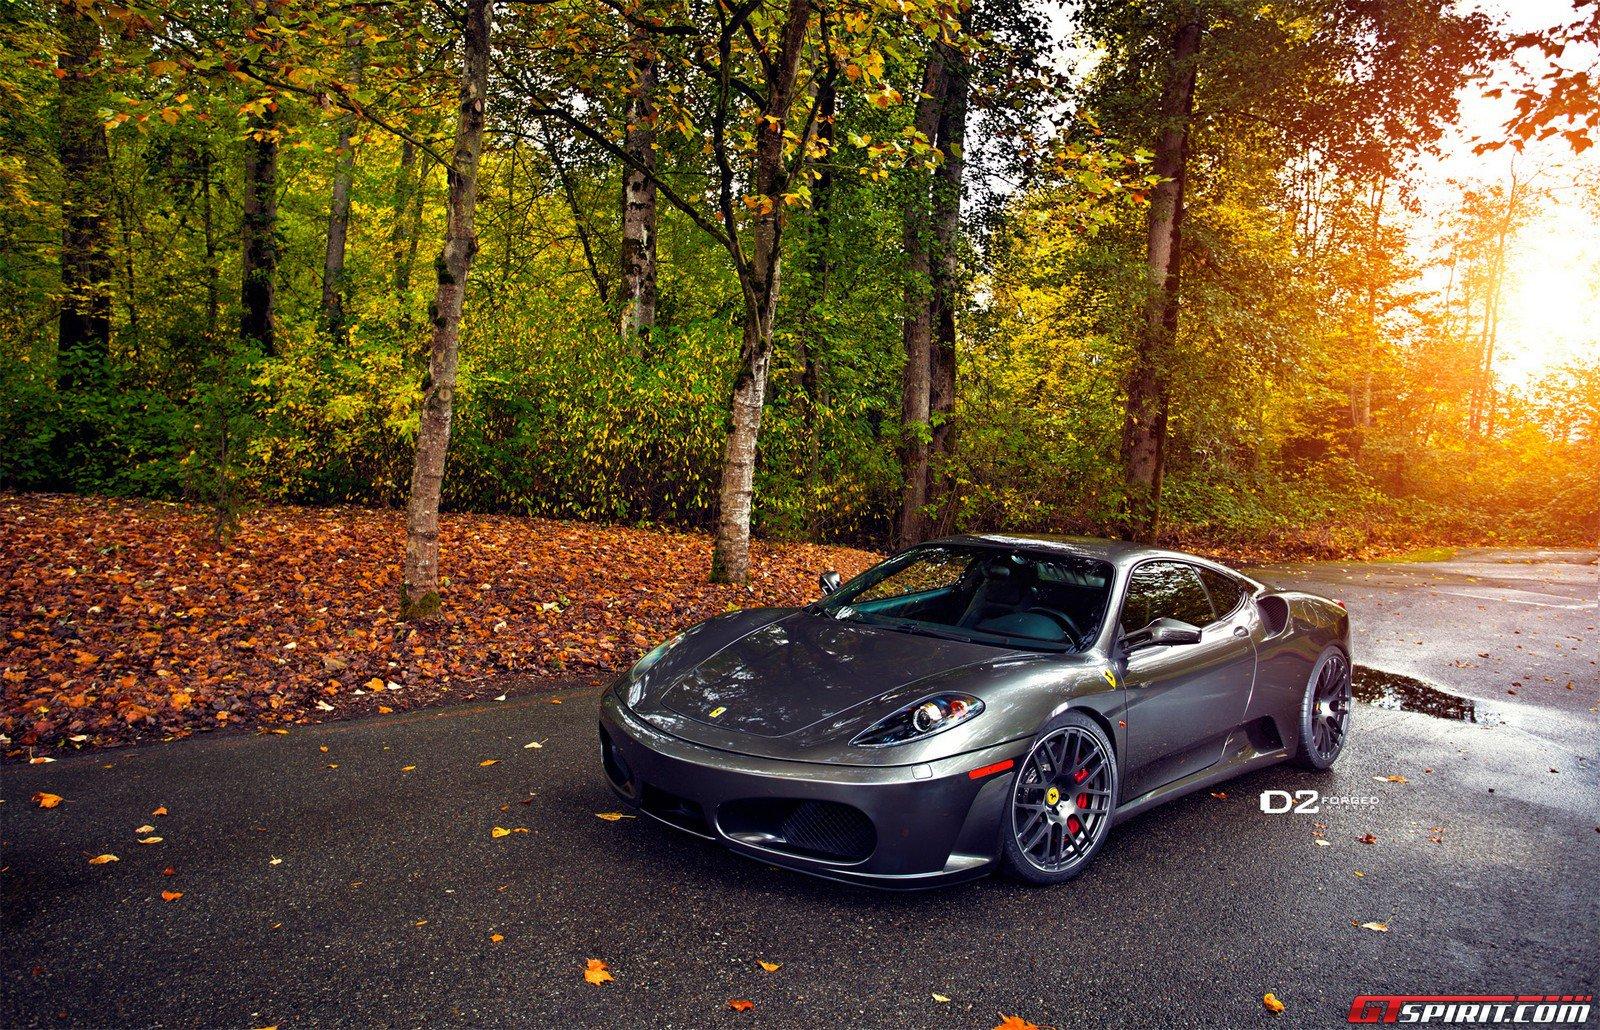 http://www.gtspirit.com/wp-content/gallery/ferrari-f430-on-d2forged-mb1-wheels/ferrari-f430-on-d2forged-mb1-wheels-004.jpg